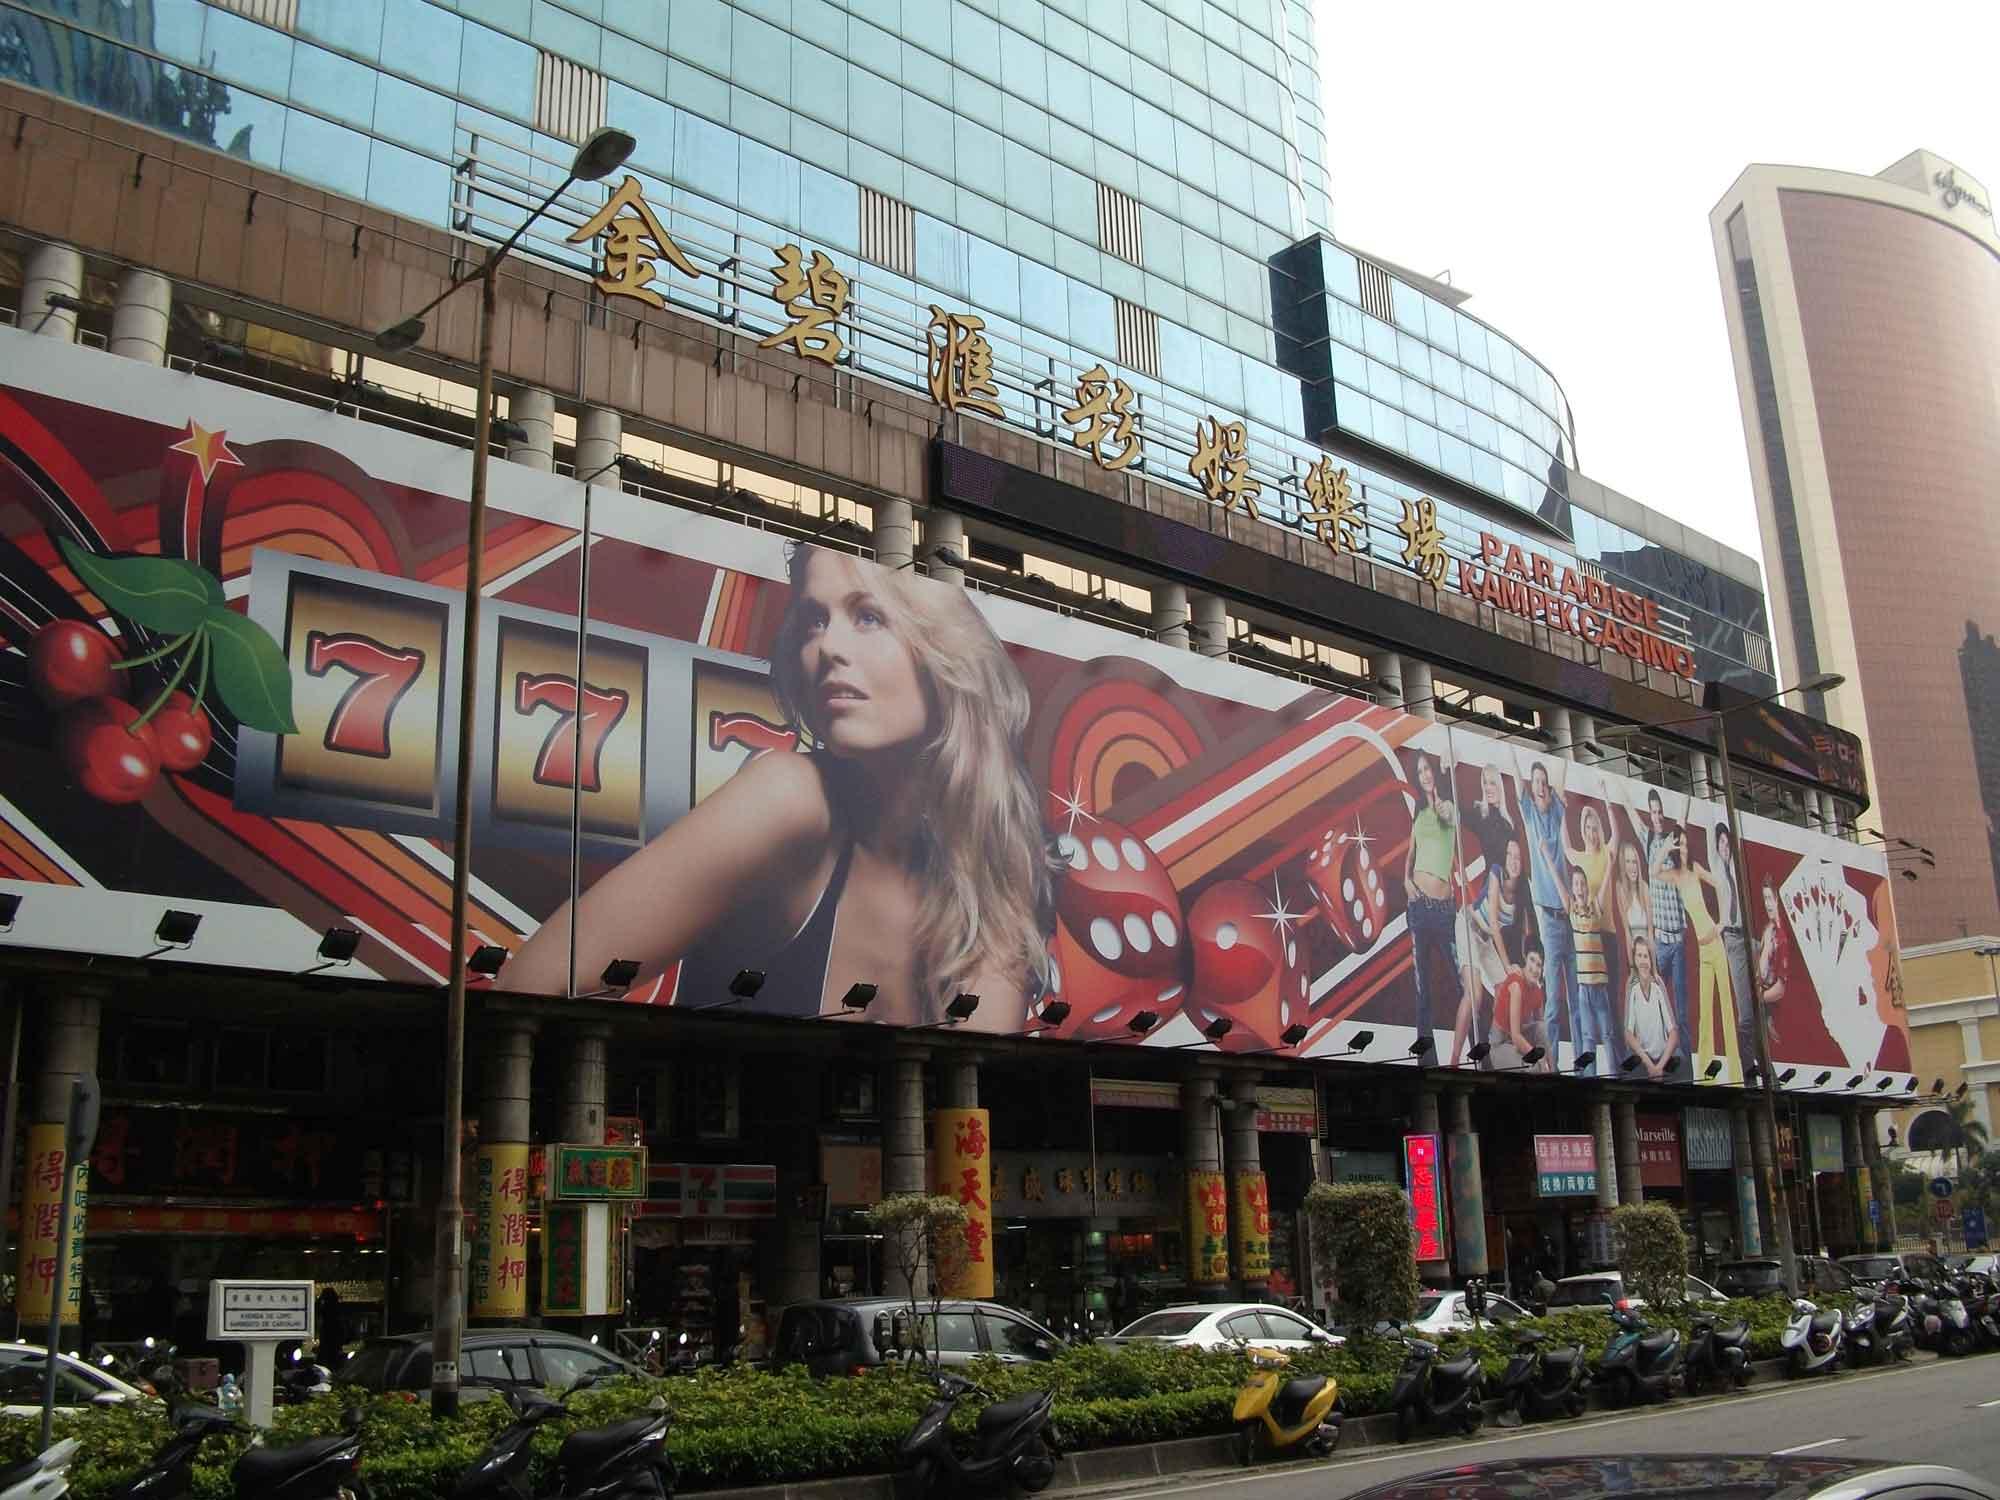 Paradise Kampek casino Macau